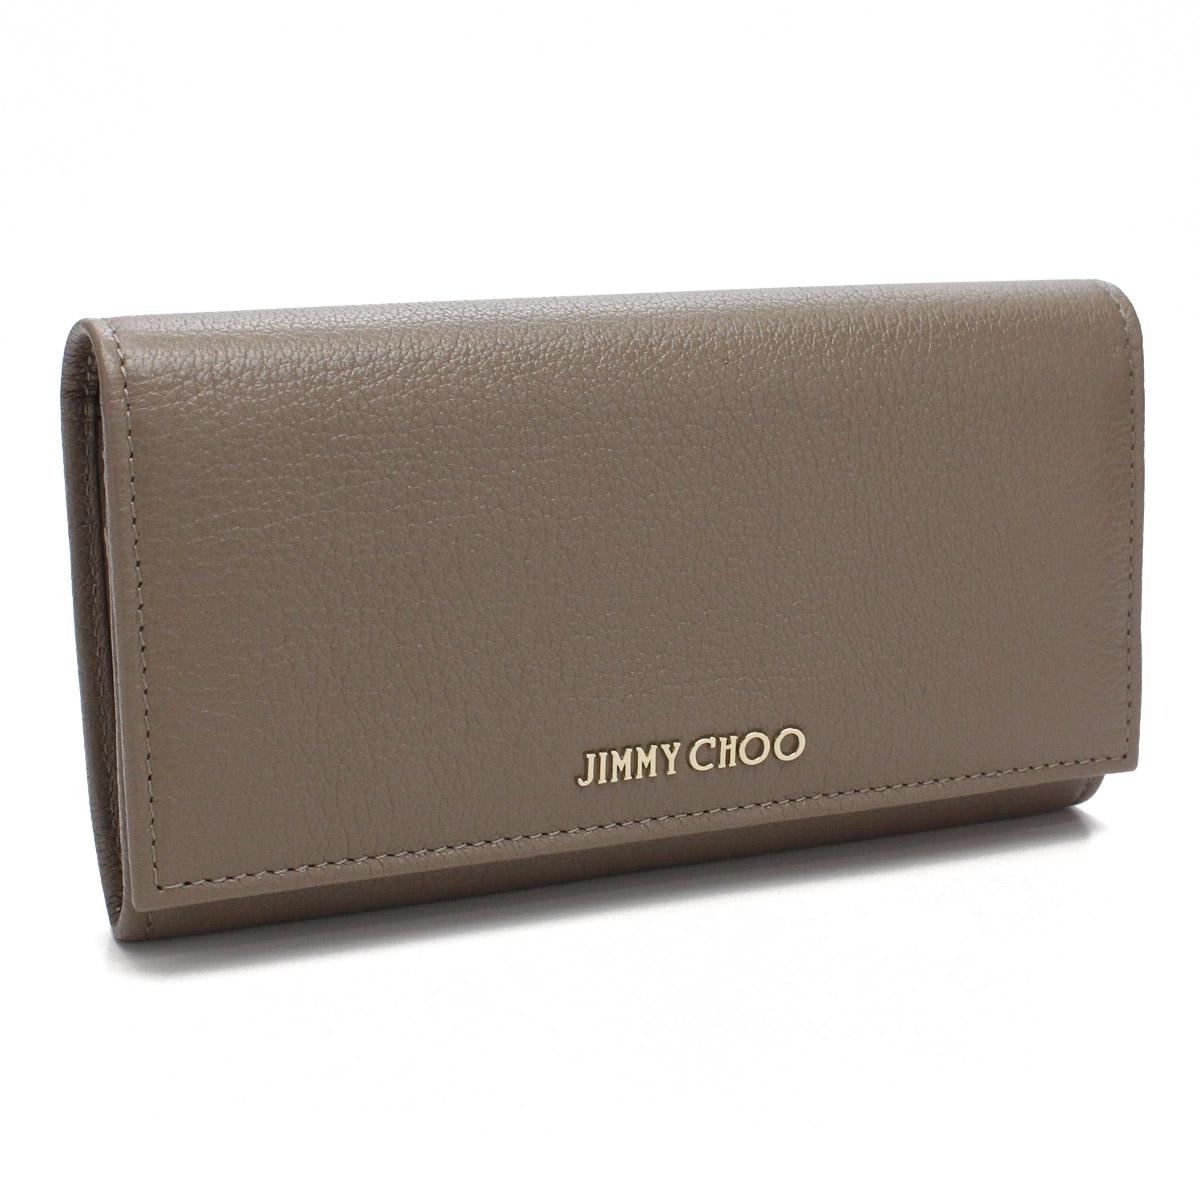 9aa2fa66bc5 Two ジミーチュウ (JIMMY CHOO) Remy fold long wallet REMY GRZ LIGHT MOCHA brown ...